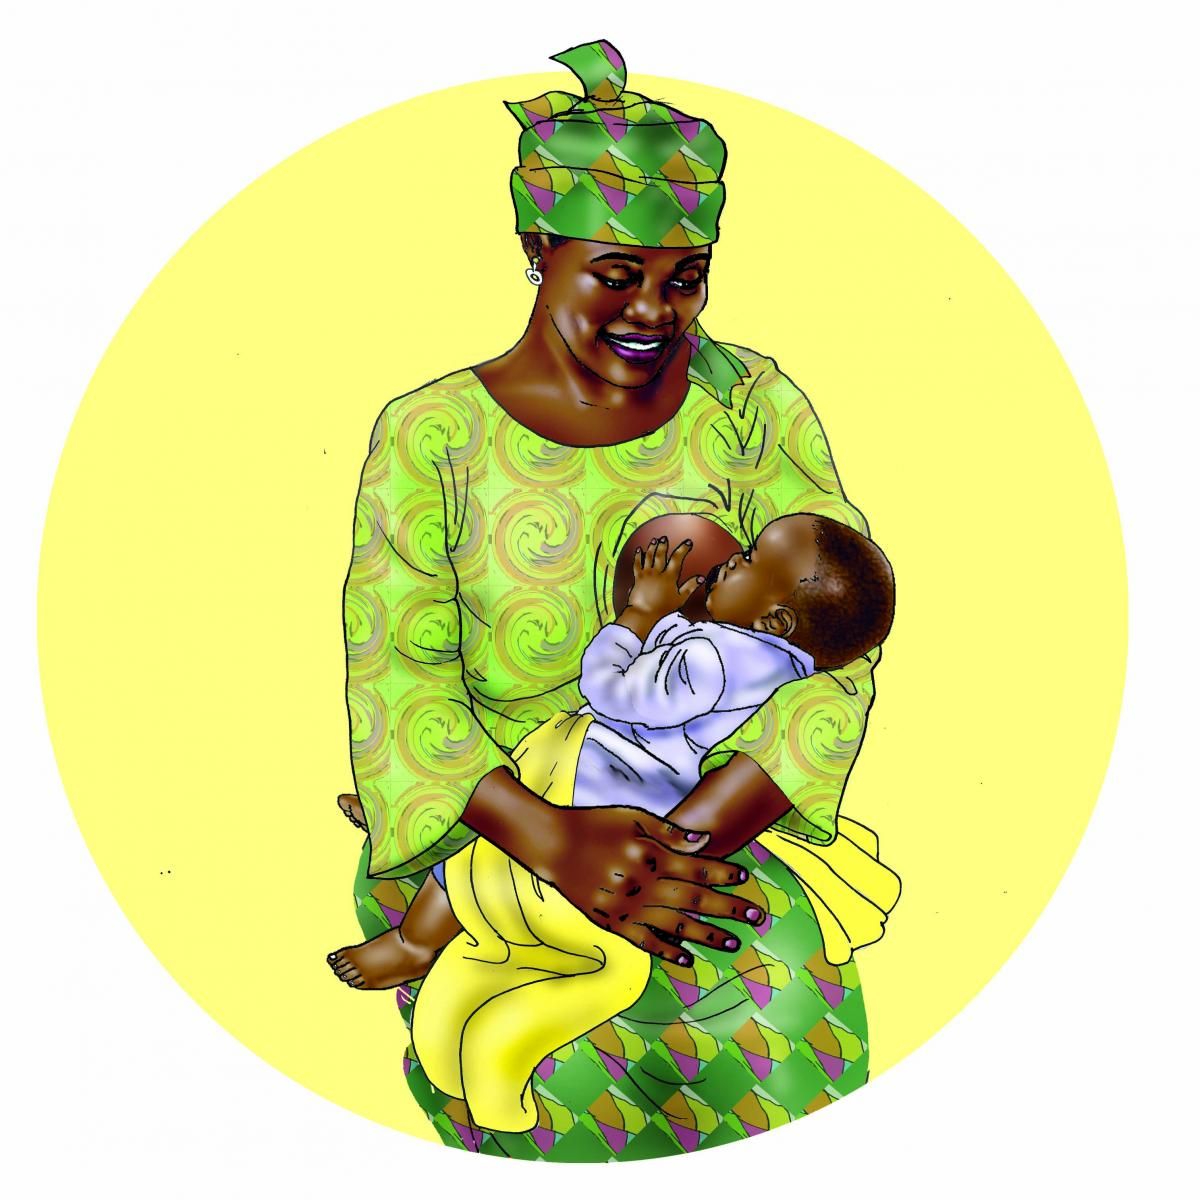 Breastfeeding - Exclusive breastfeeding 6-9 mo - 00A - Benin